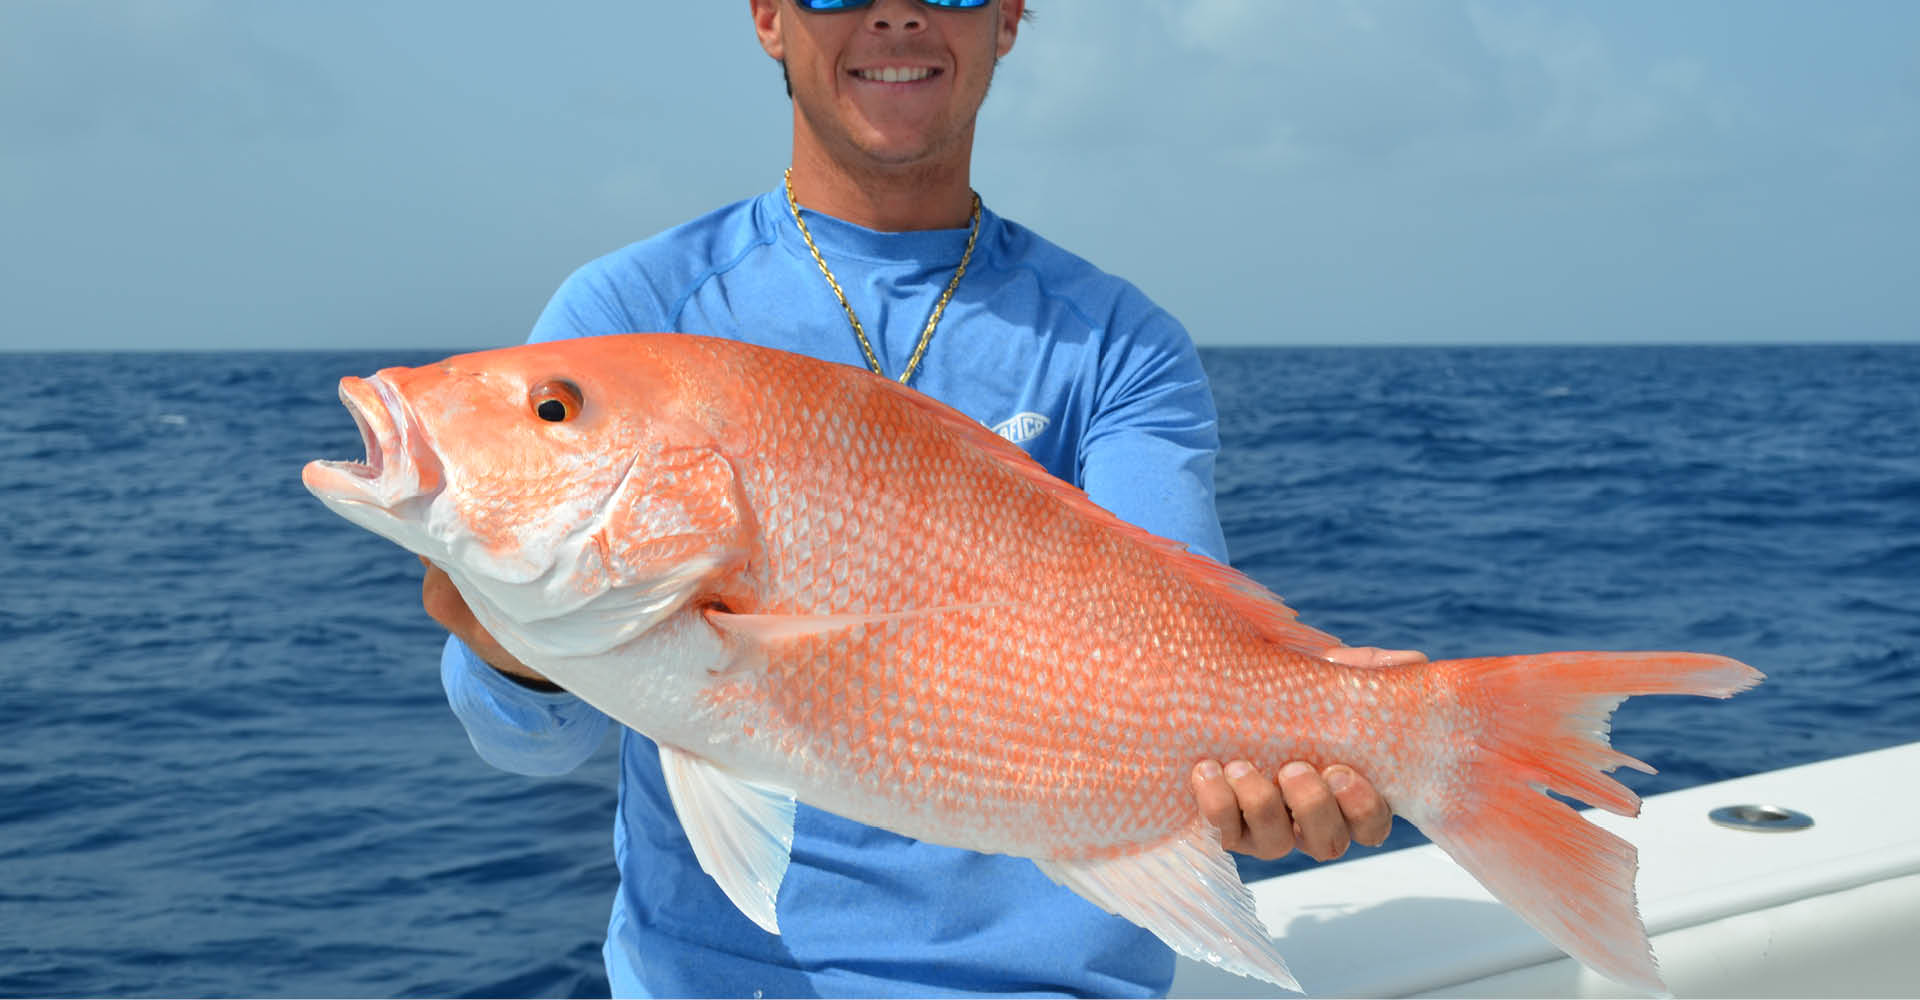 Handling Fish